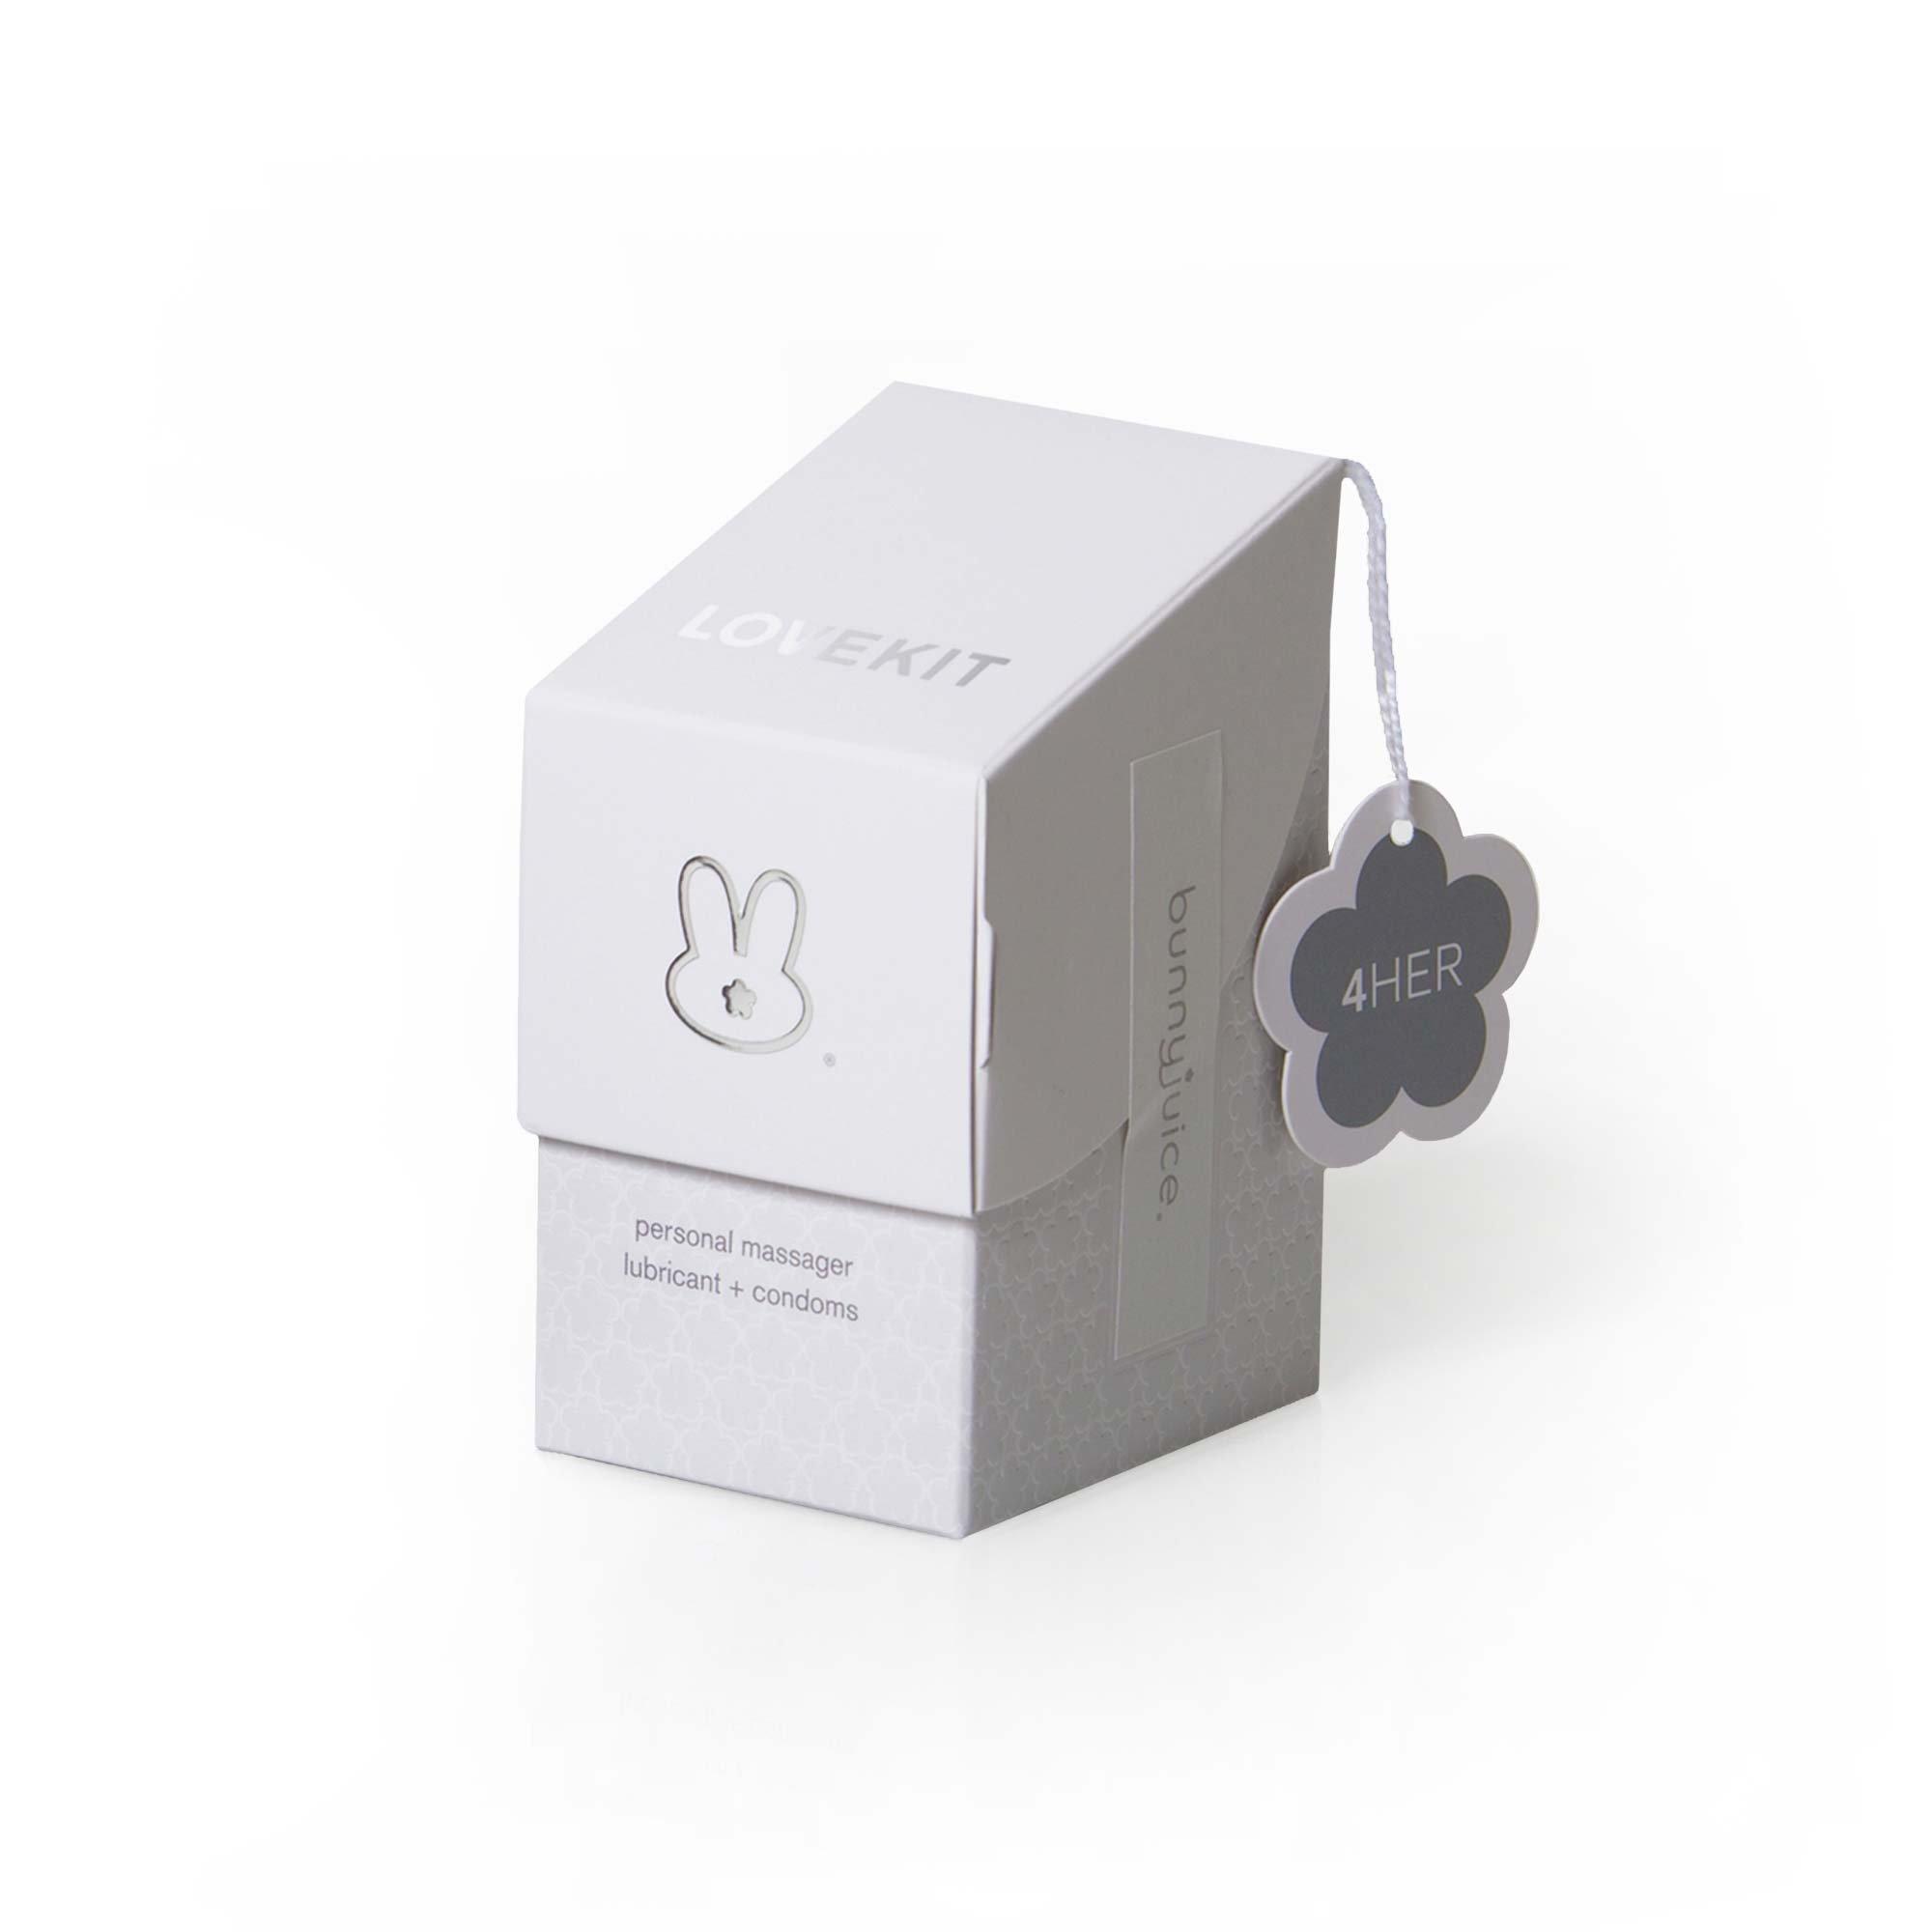 Bunnyjuice Wildbunny Midnight Edition Intimacy Love Kit 4her, White